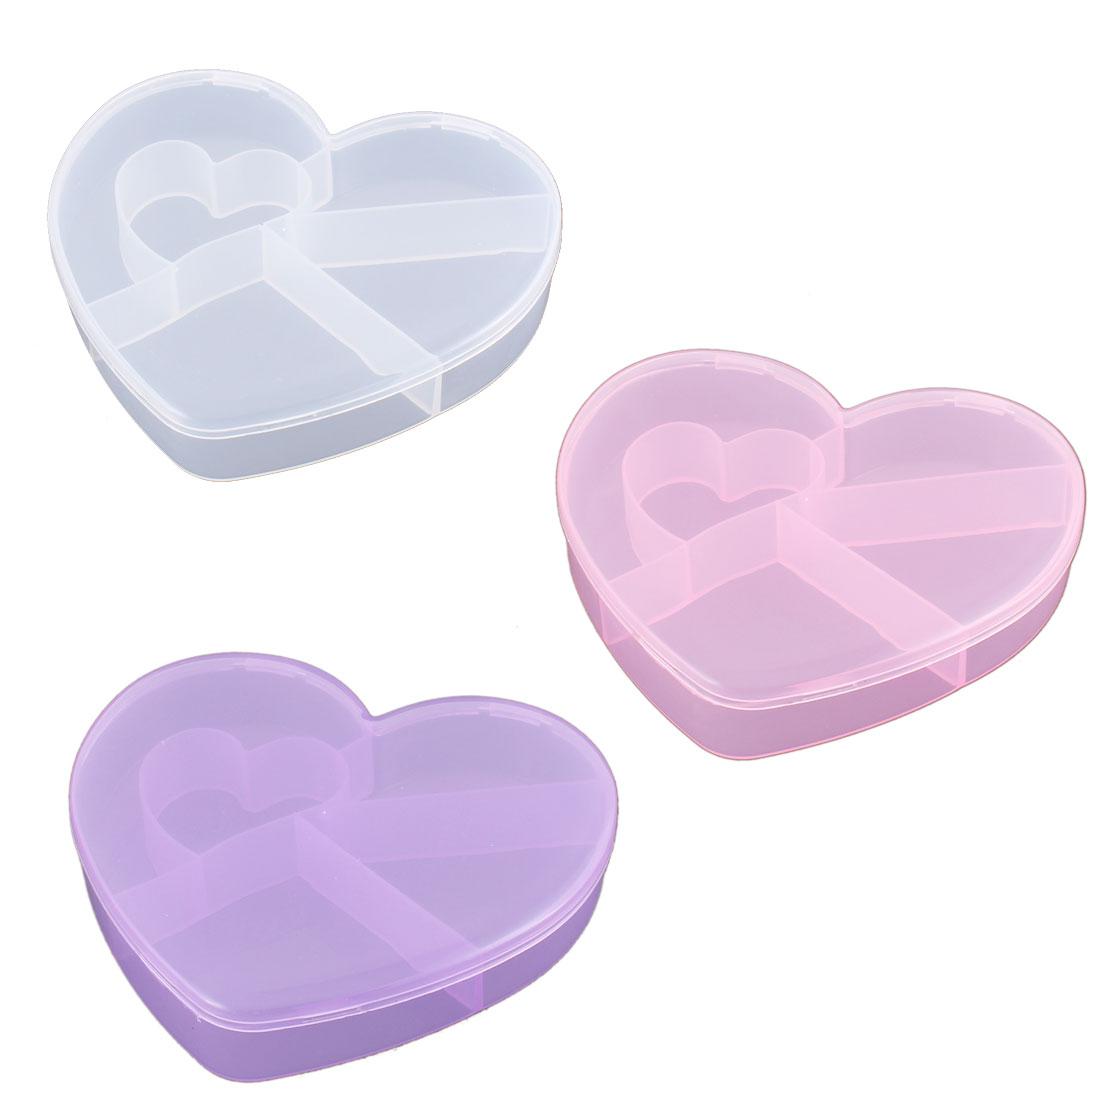 Medicine Plastic Heart Shaped 5 Slots Storage Box Case Organizer Container 3pcs